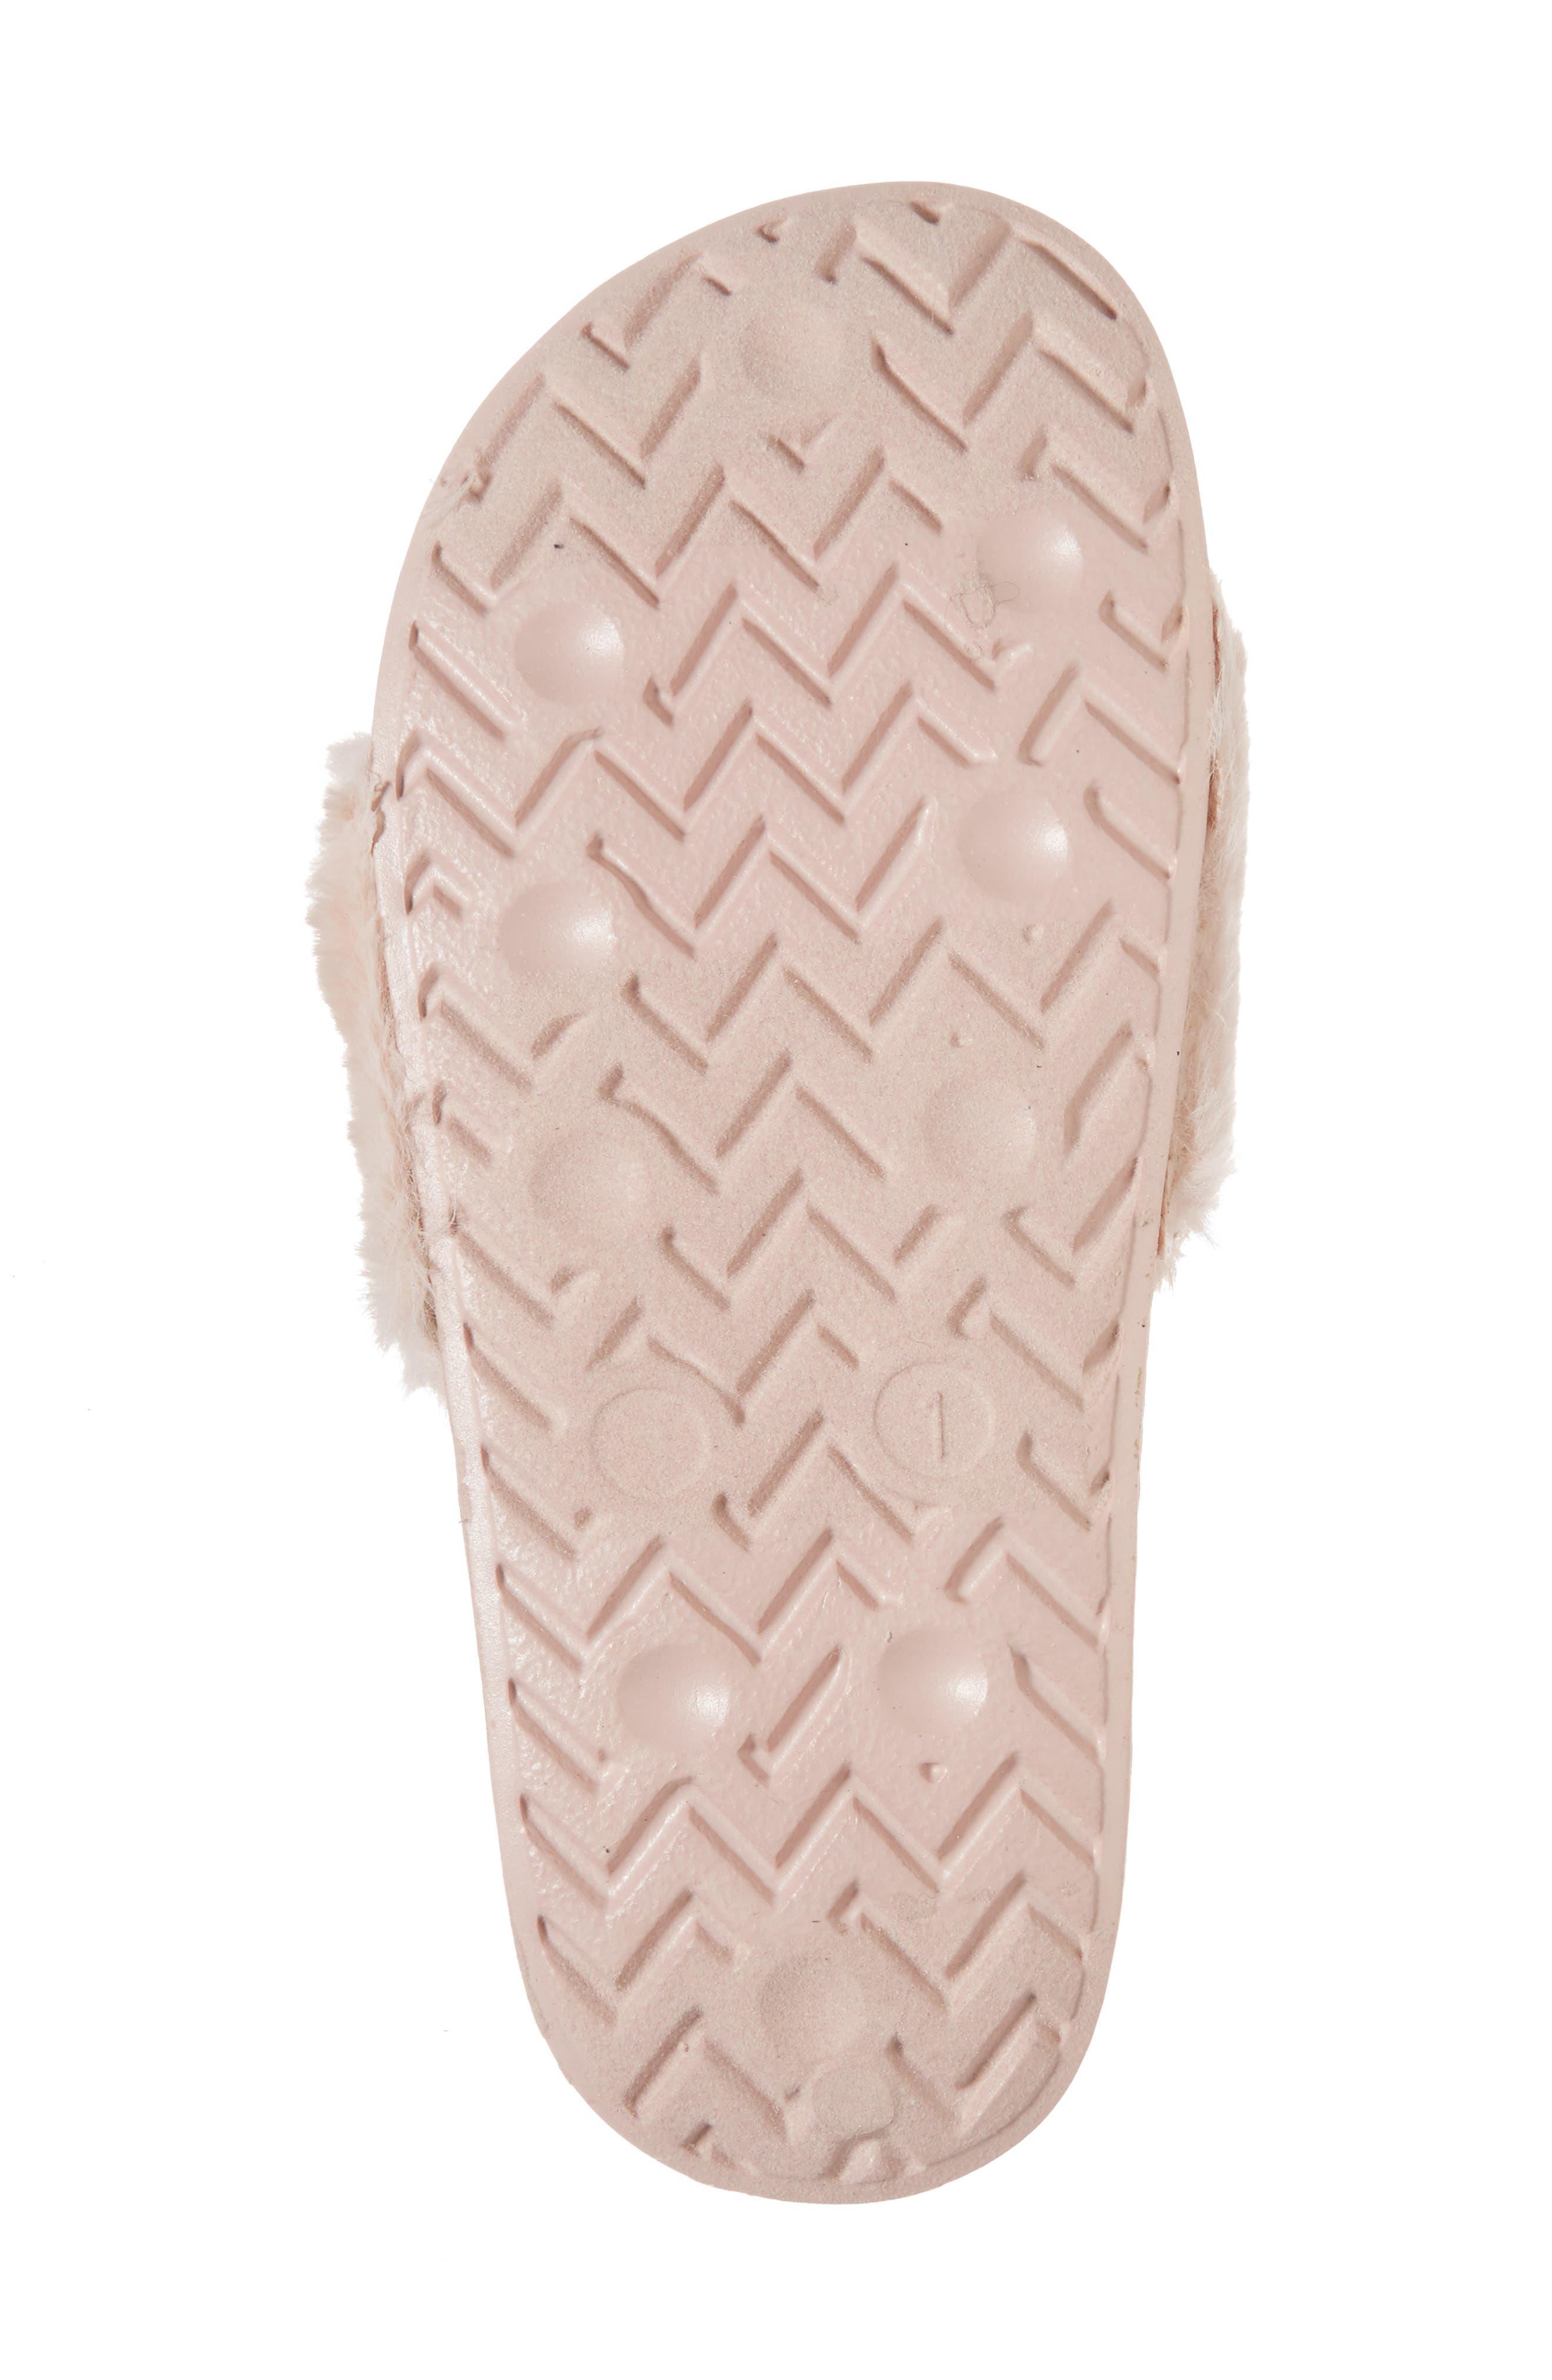 Mackie Furry Faux Fur Slide Sandal,                             Alternate thumbnail 6, color,                             Blush Faux Fur